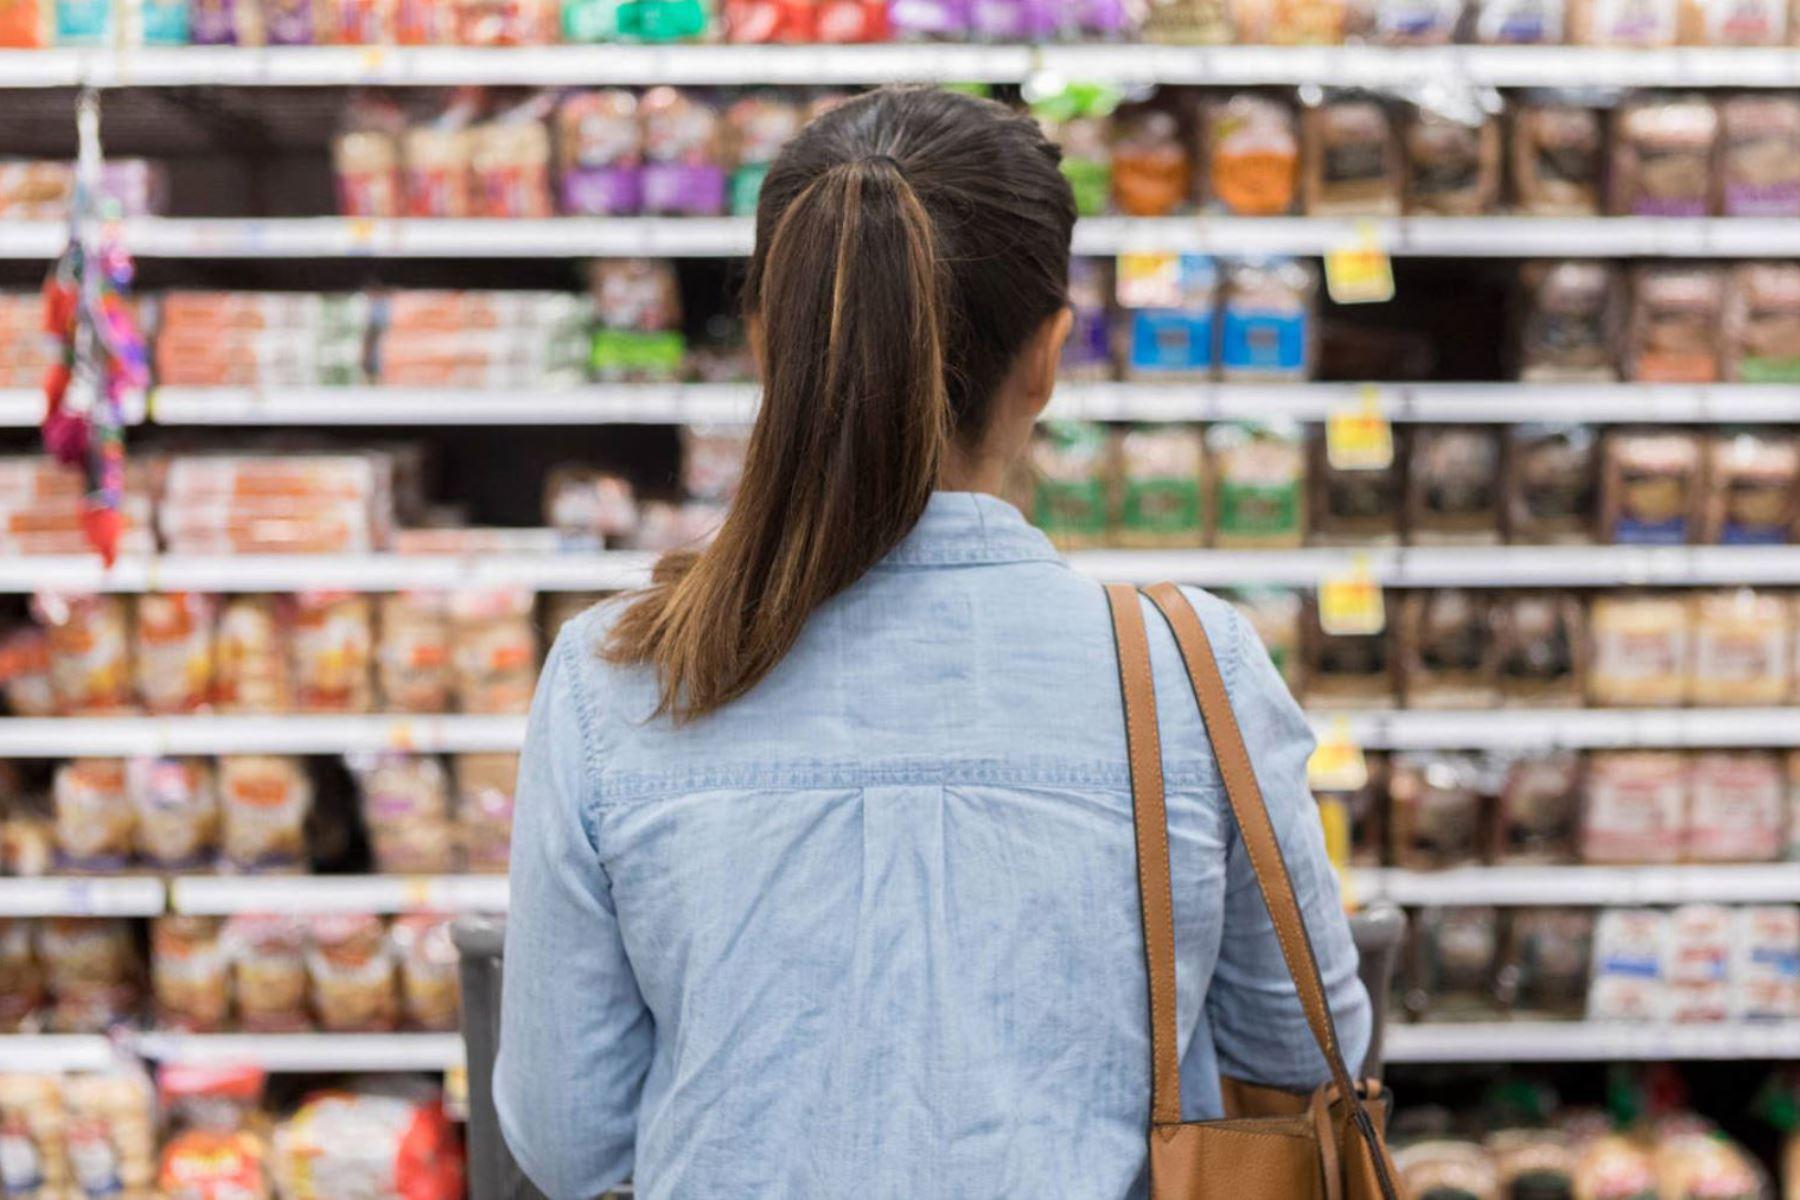 Nutricionista revela 5 hábitos alimenticios que están perjudicando tu salud